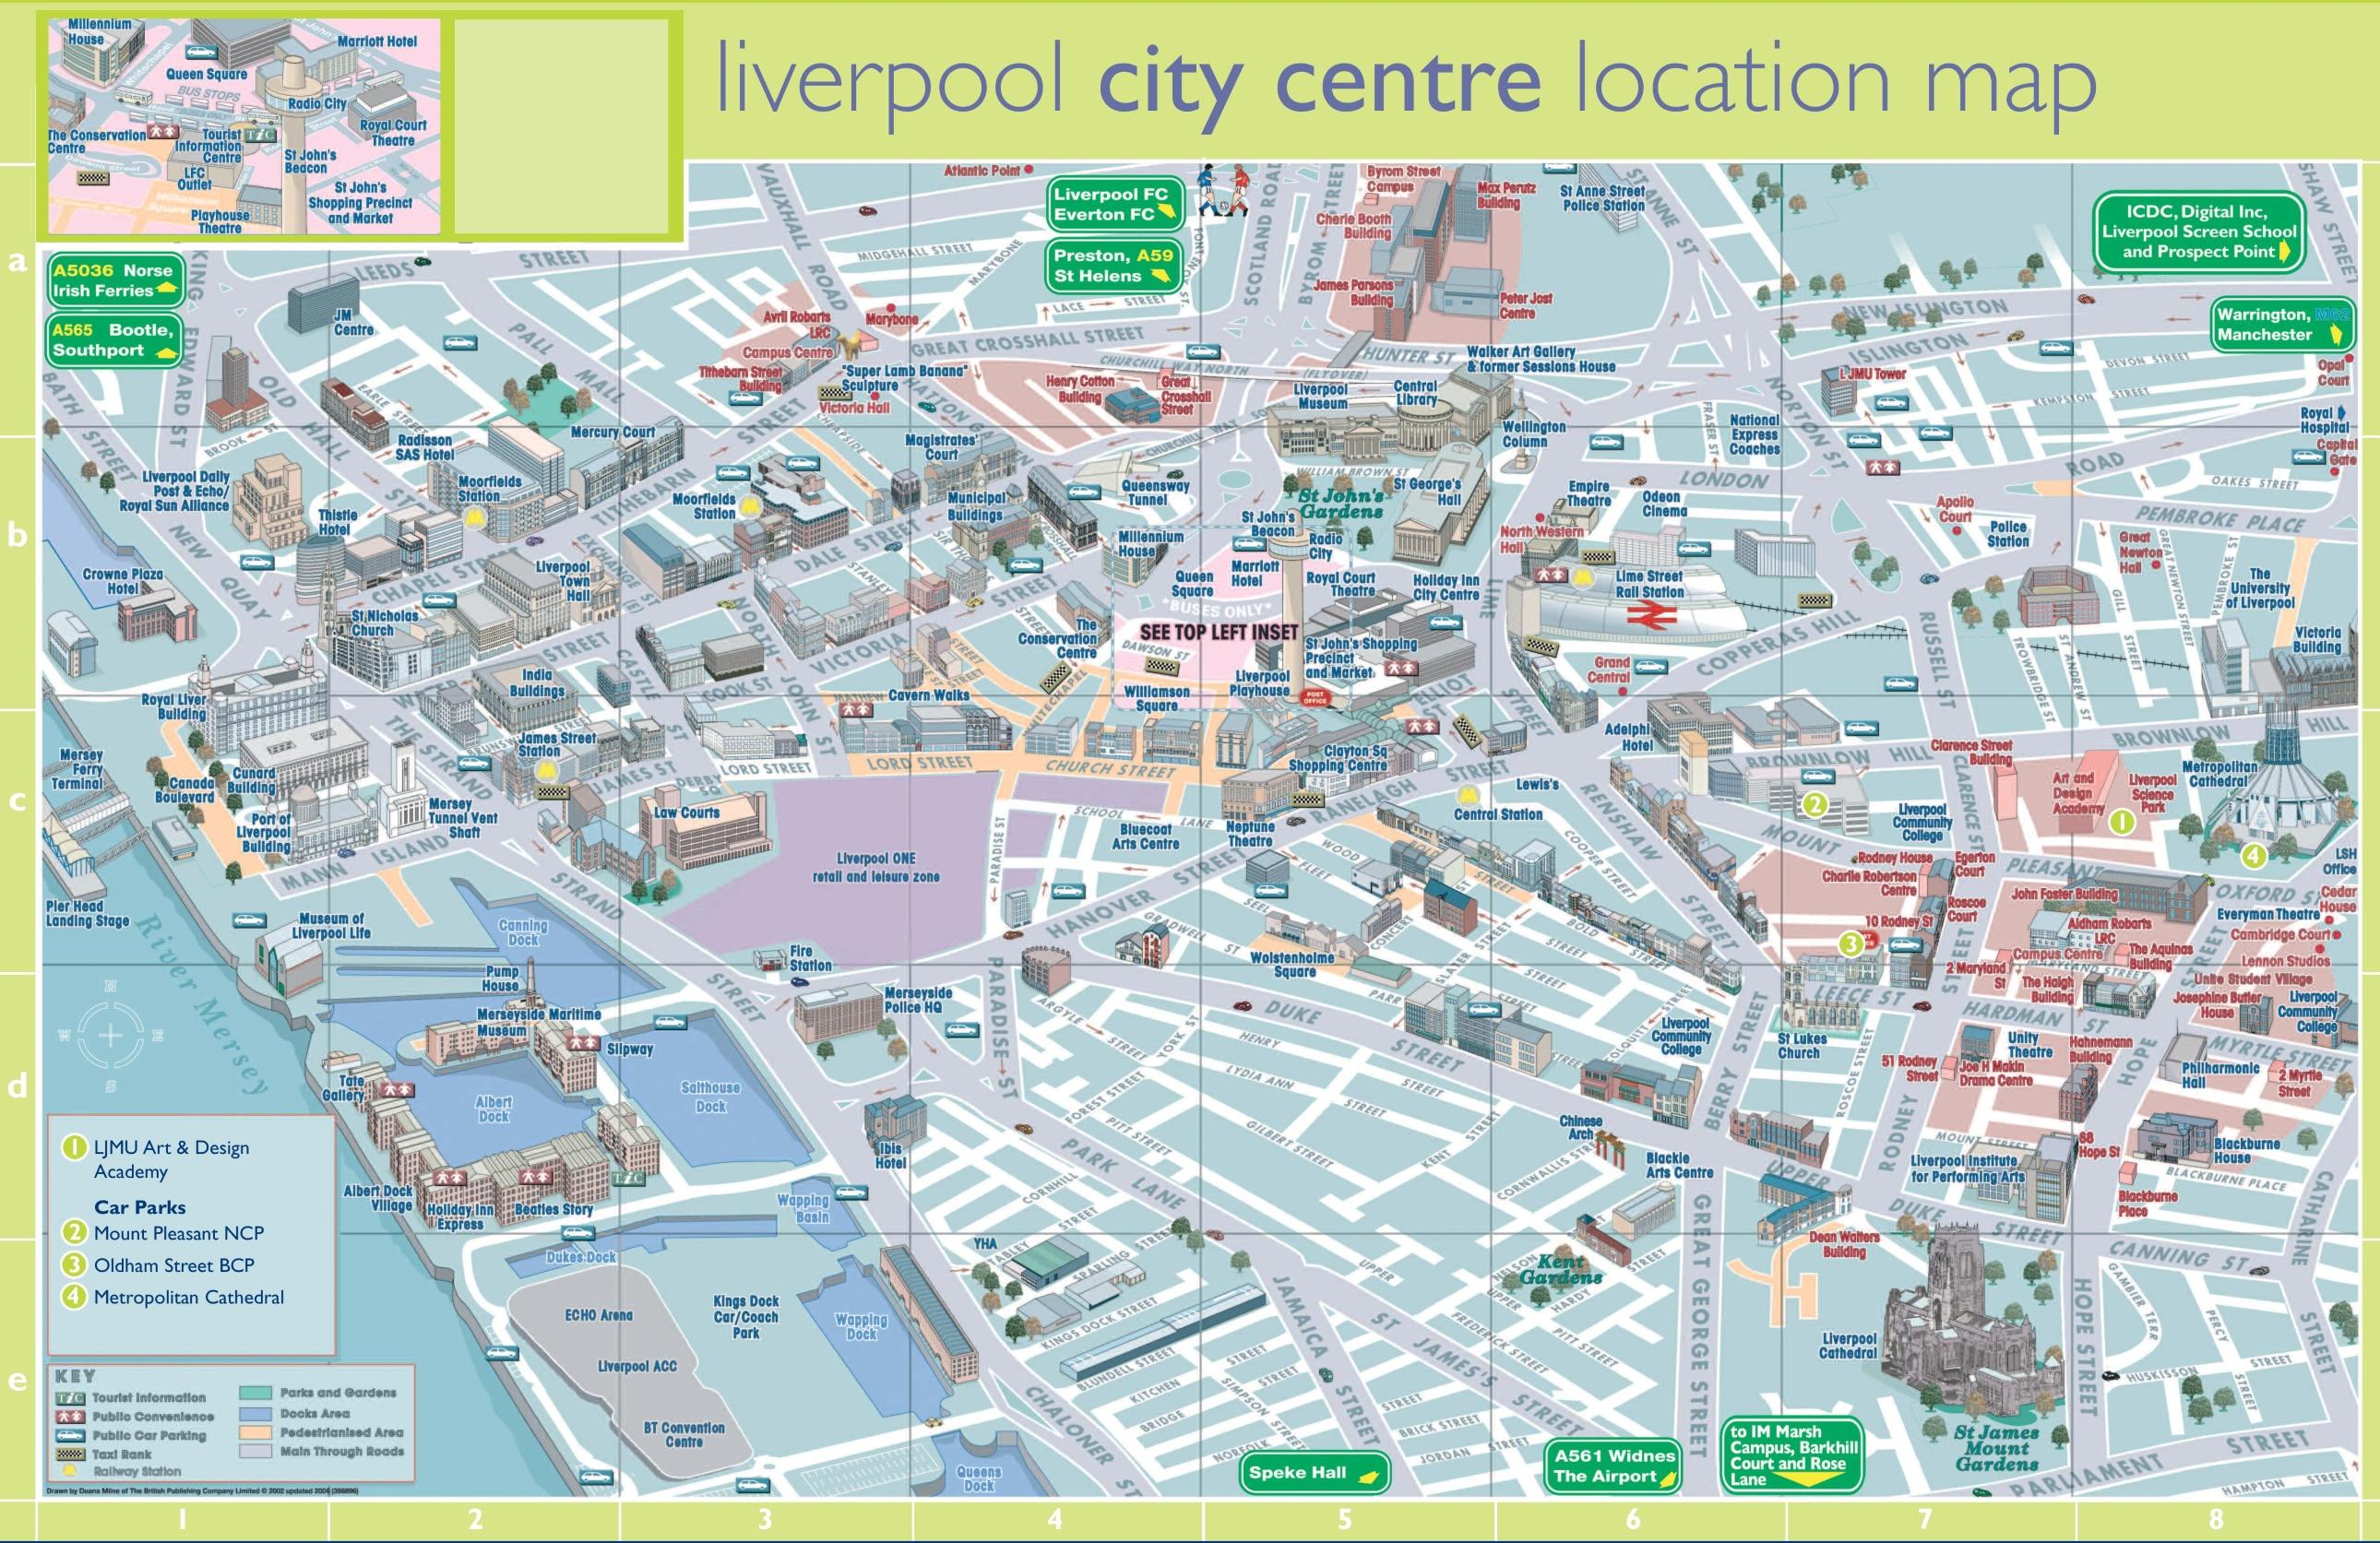 Liverpool Tourist Map Liverpool tourist map Liverpool Tourist Map